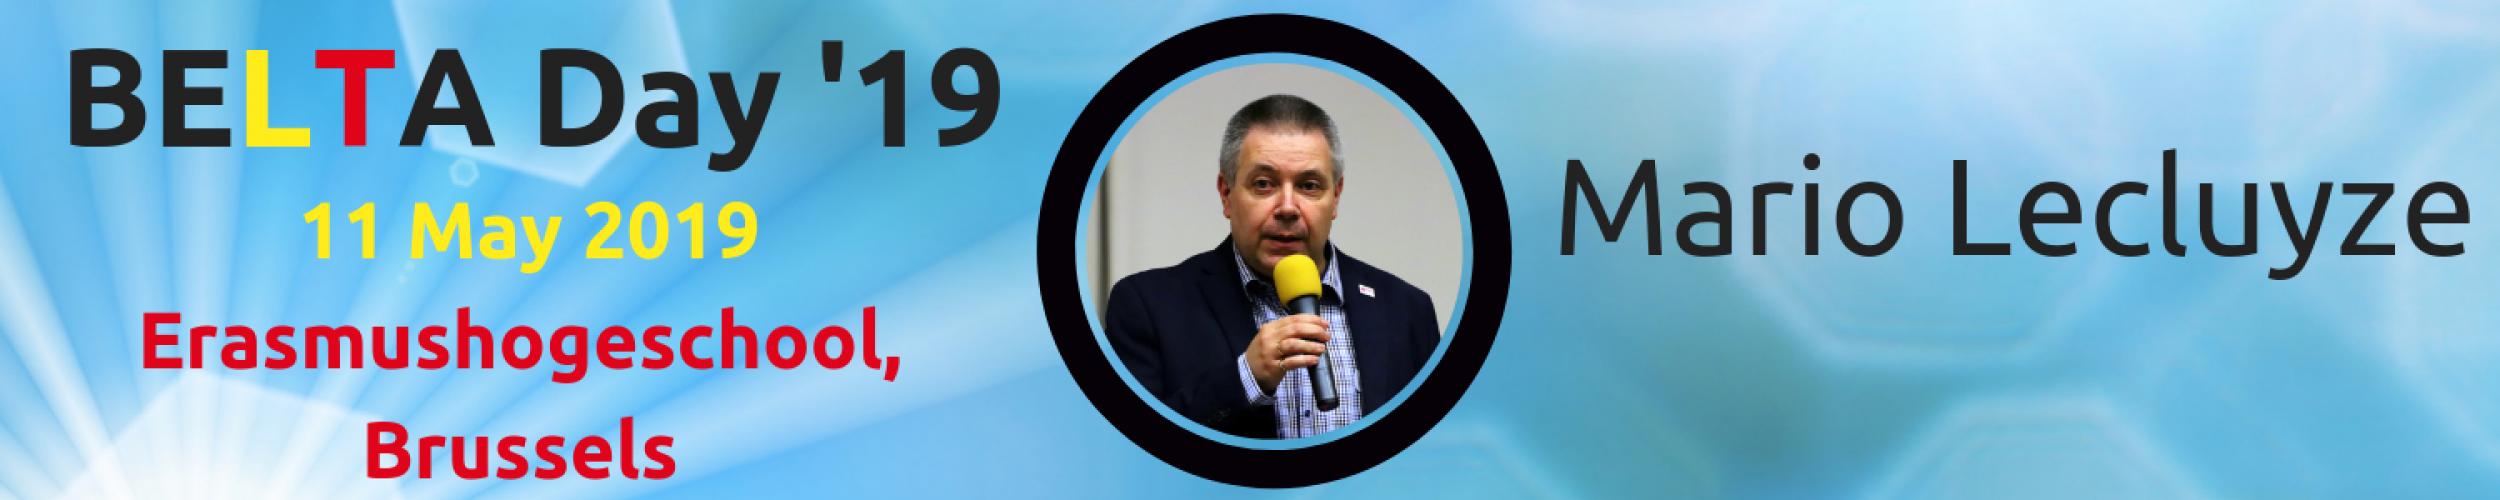 BELTA Day '19: Meet the Speakers: Mario Lecluyze